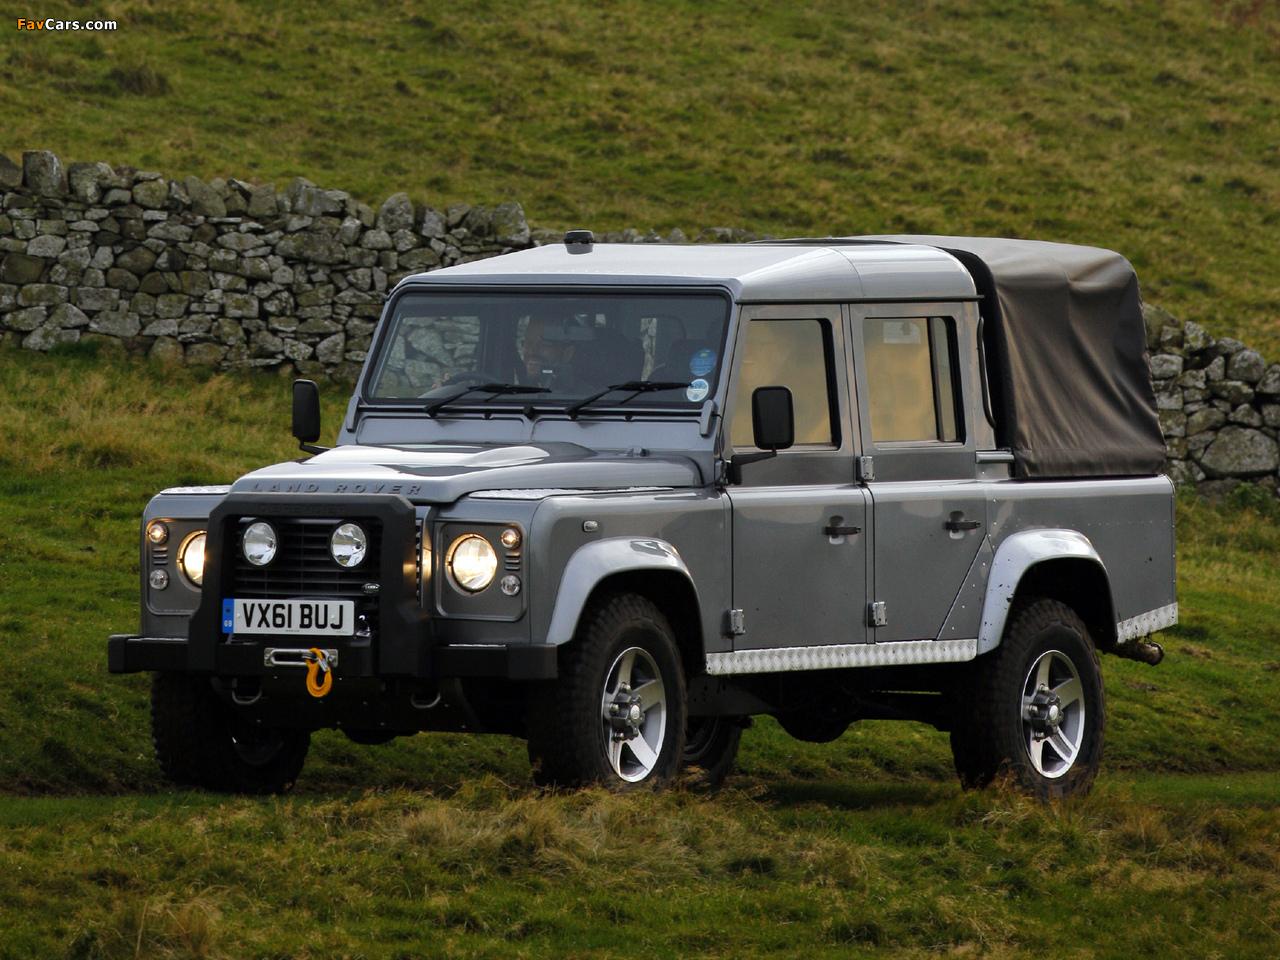 Land Rover Defender 110 >> Land Rover Defender 110 Double Cab Pickup UK-spec 2007 images (1280x960)